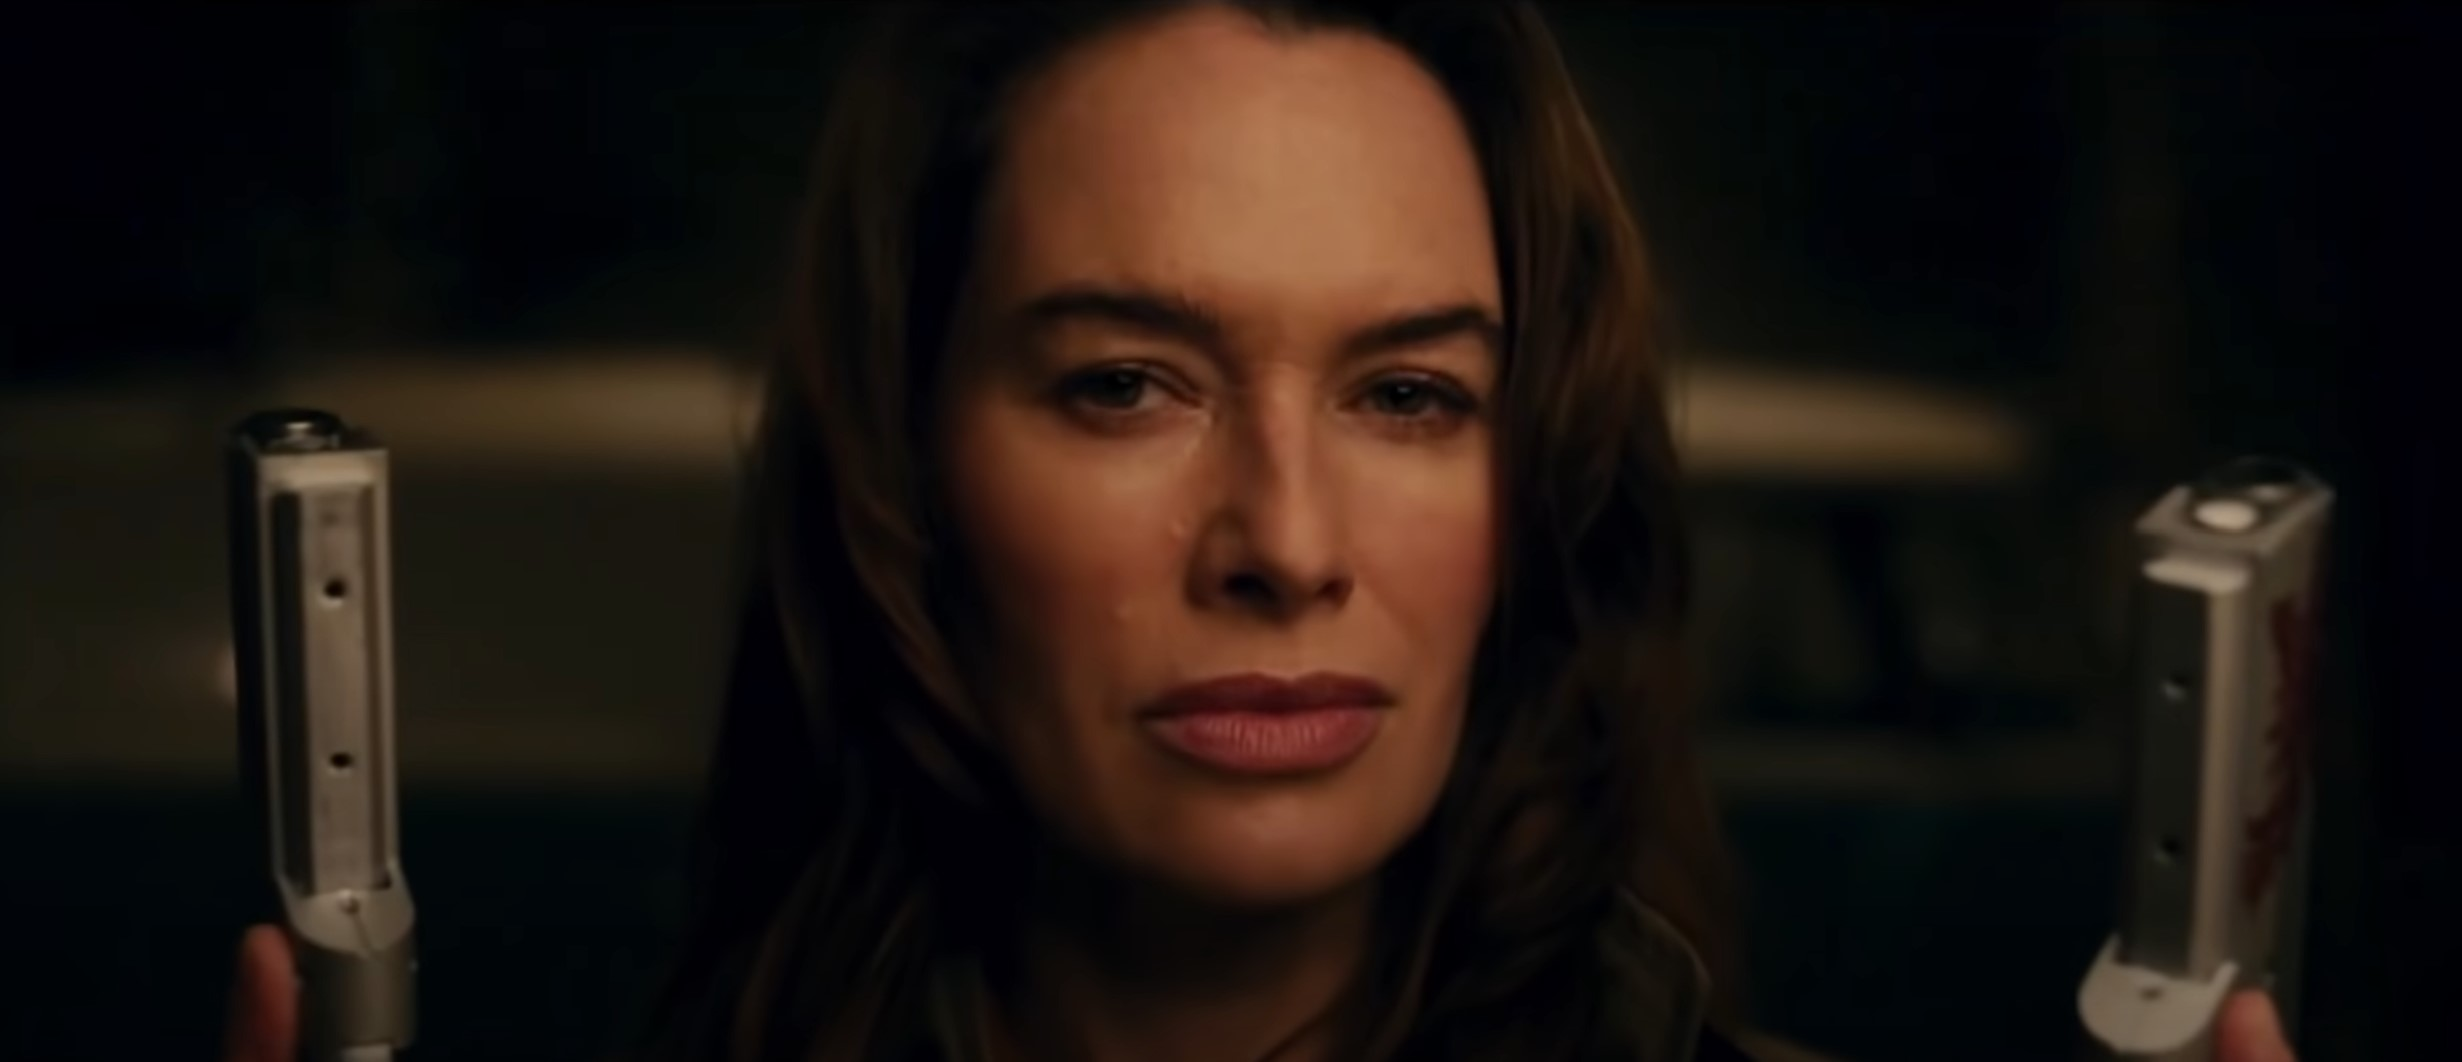 'Gunpowder Milkshake' Review: The Stylish Neon Noir Woman-centric Film of 2021